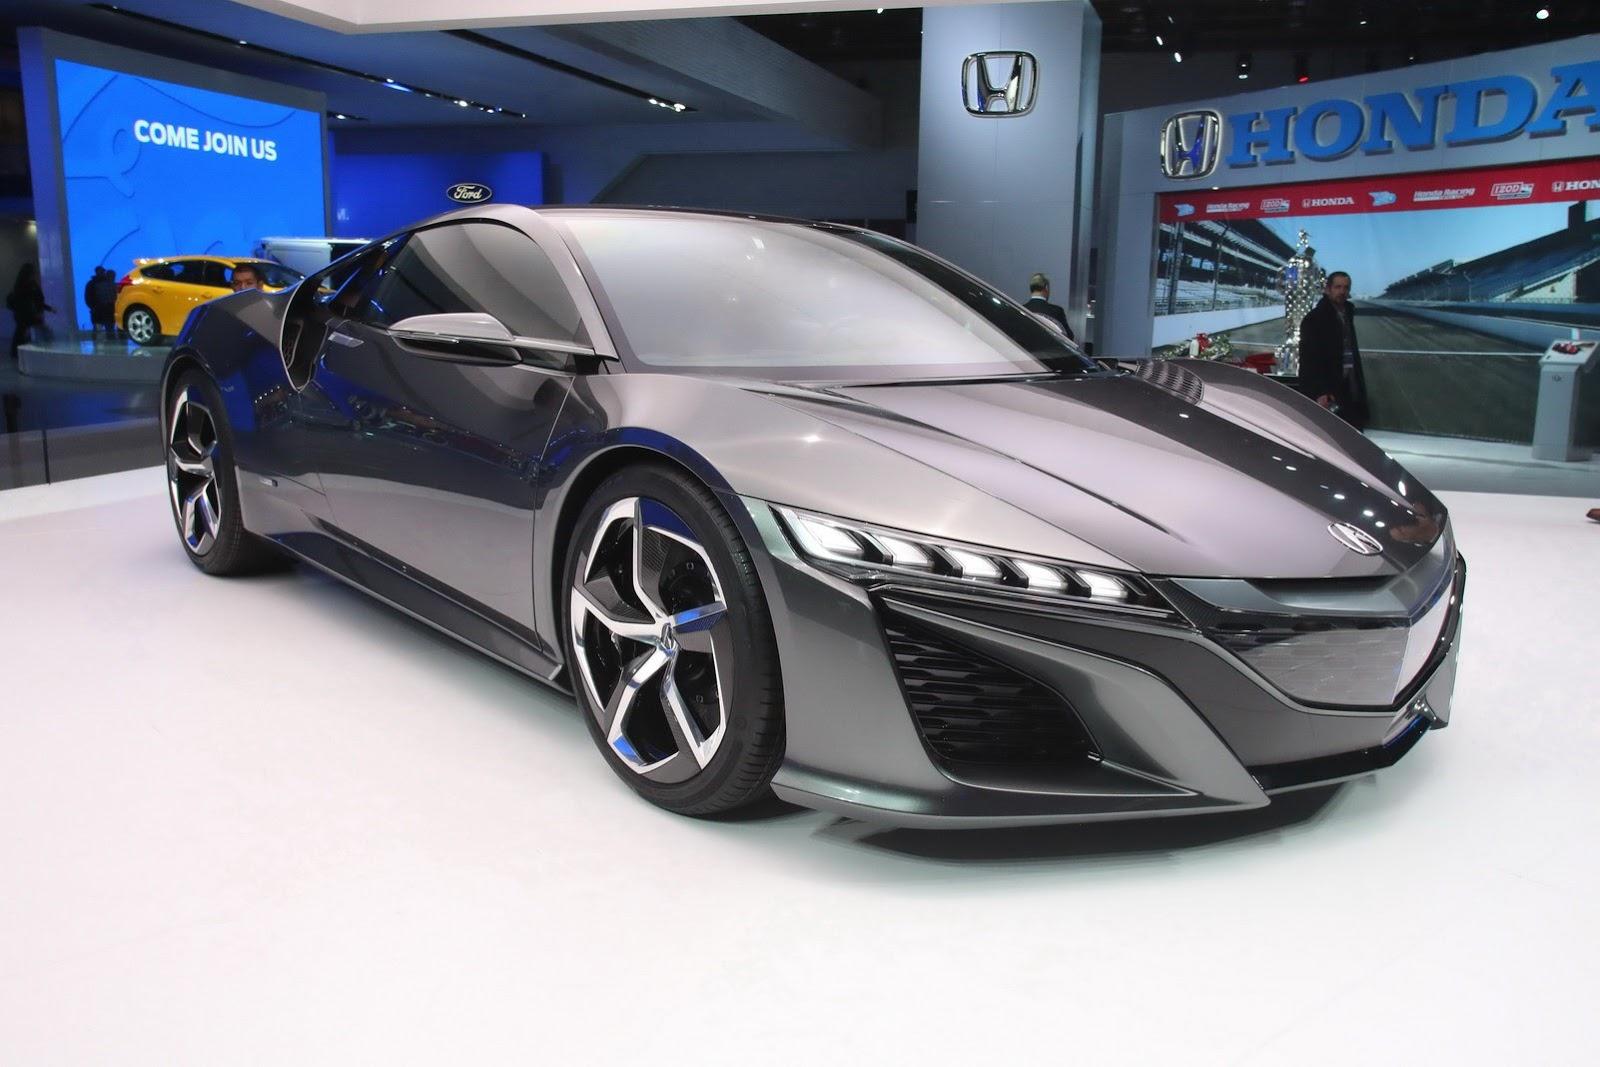 2015 - [Honda] NSX - Page 6 Acura-NSX-Concept-II-3%25255B2%25255D